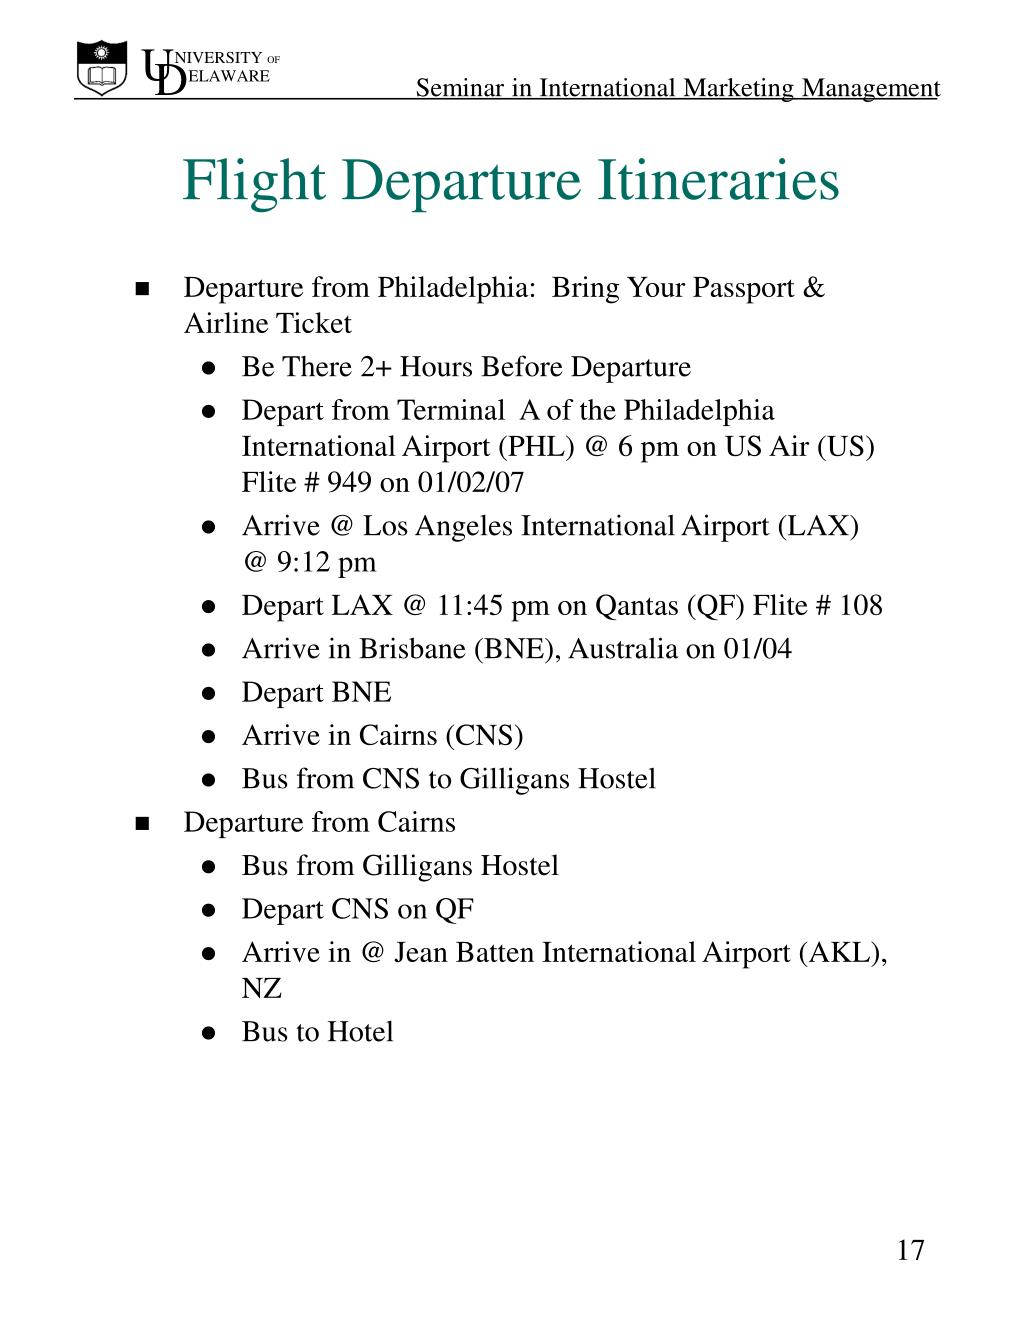 Flight Departure Itineraries